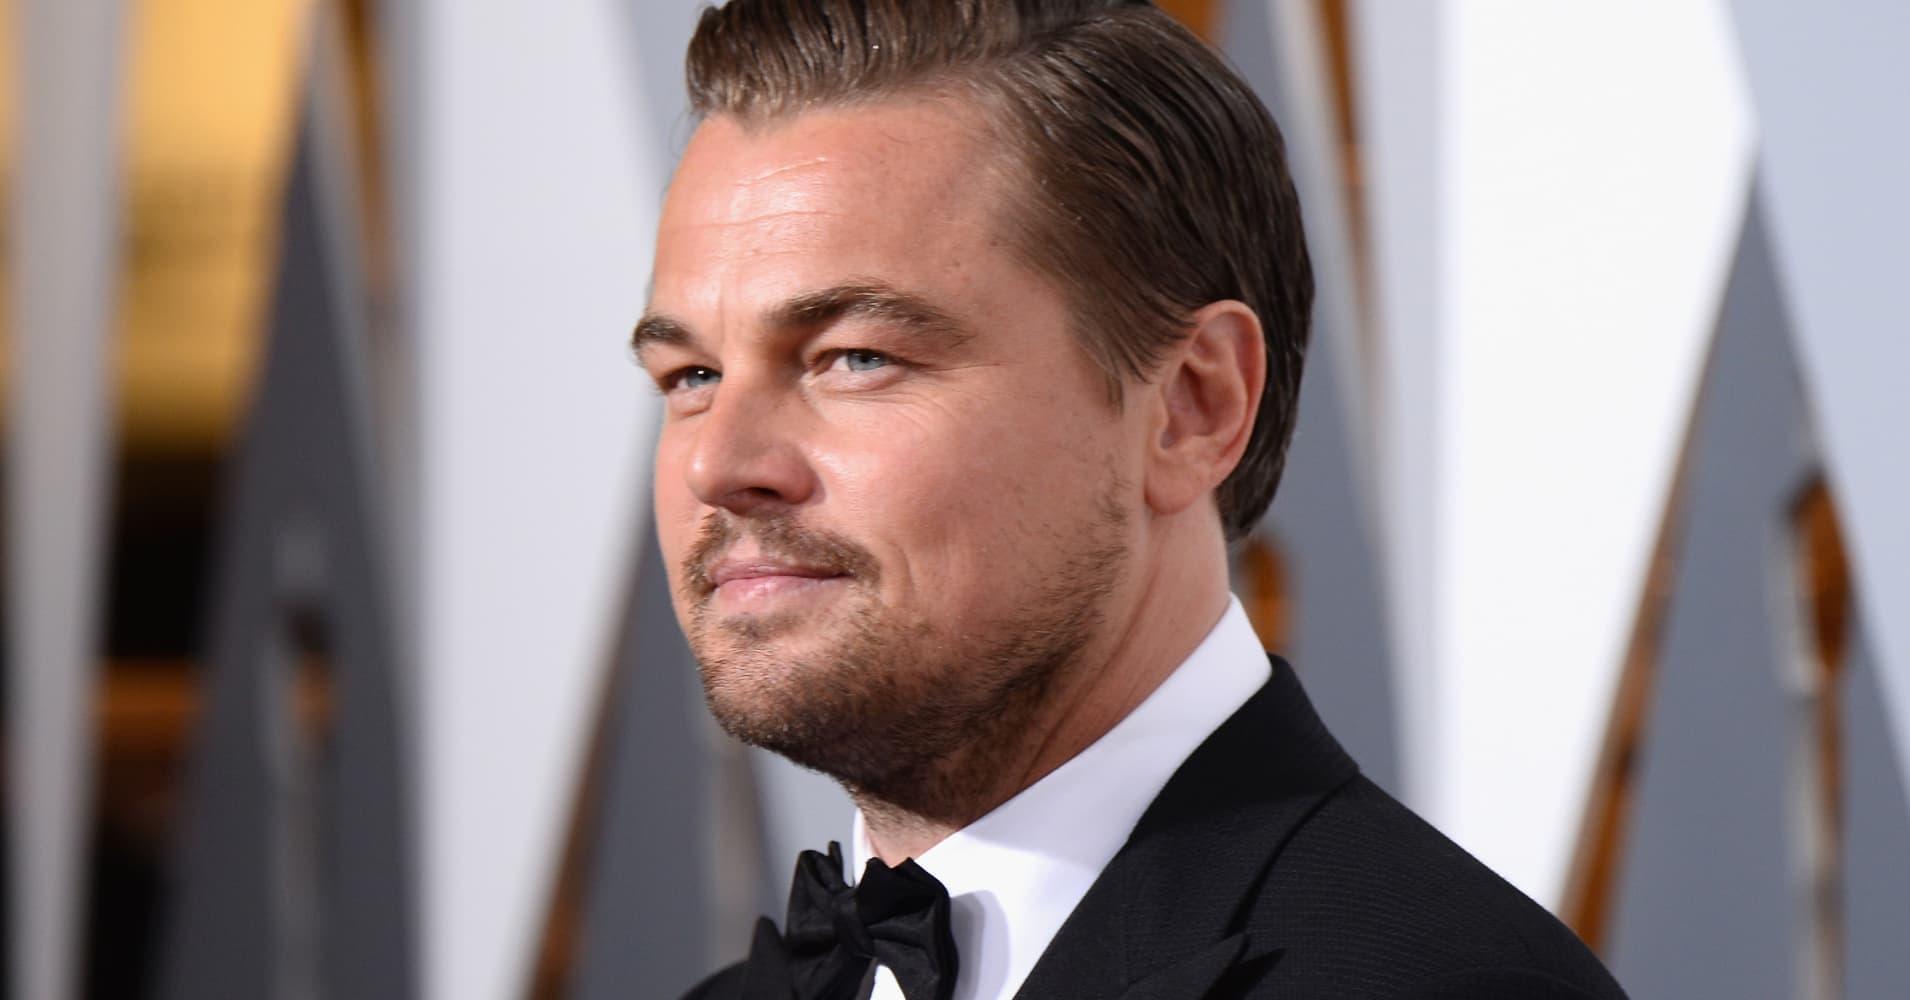 An Ethical Diamond Venture That Has Backing From Leonardo